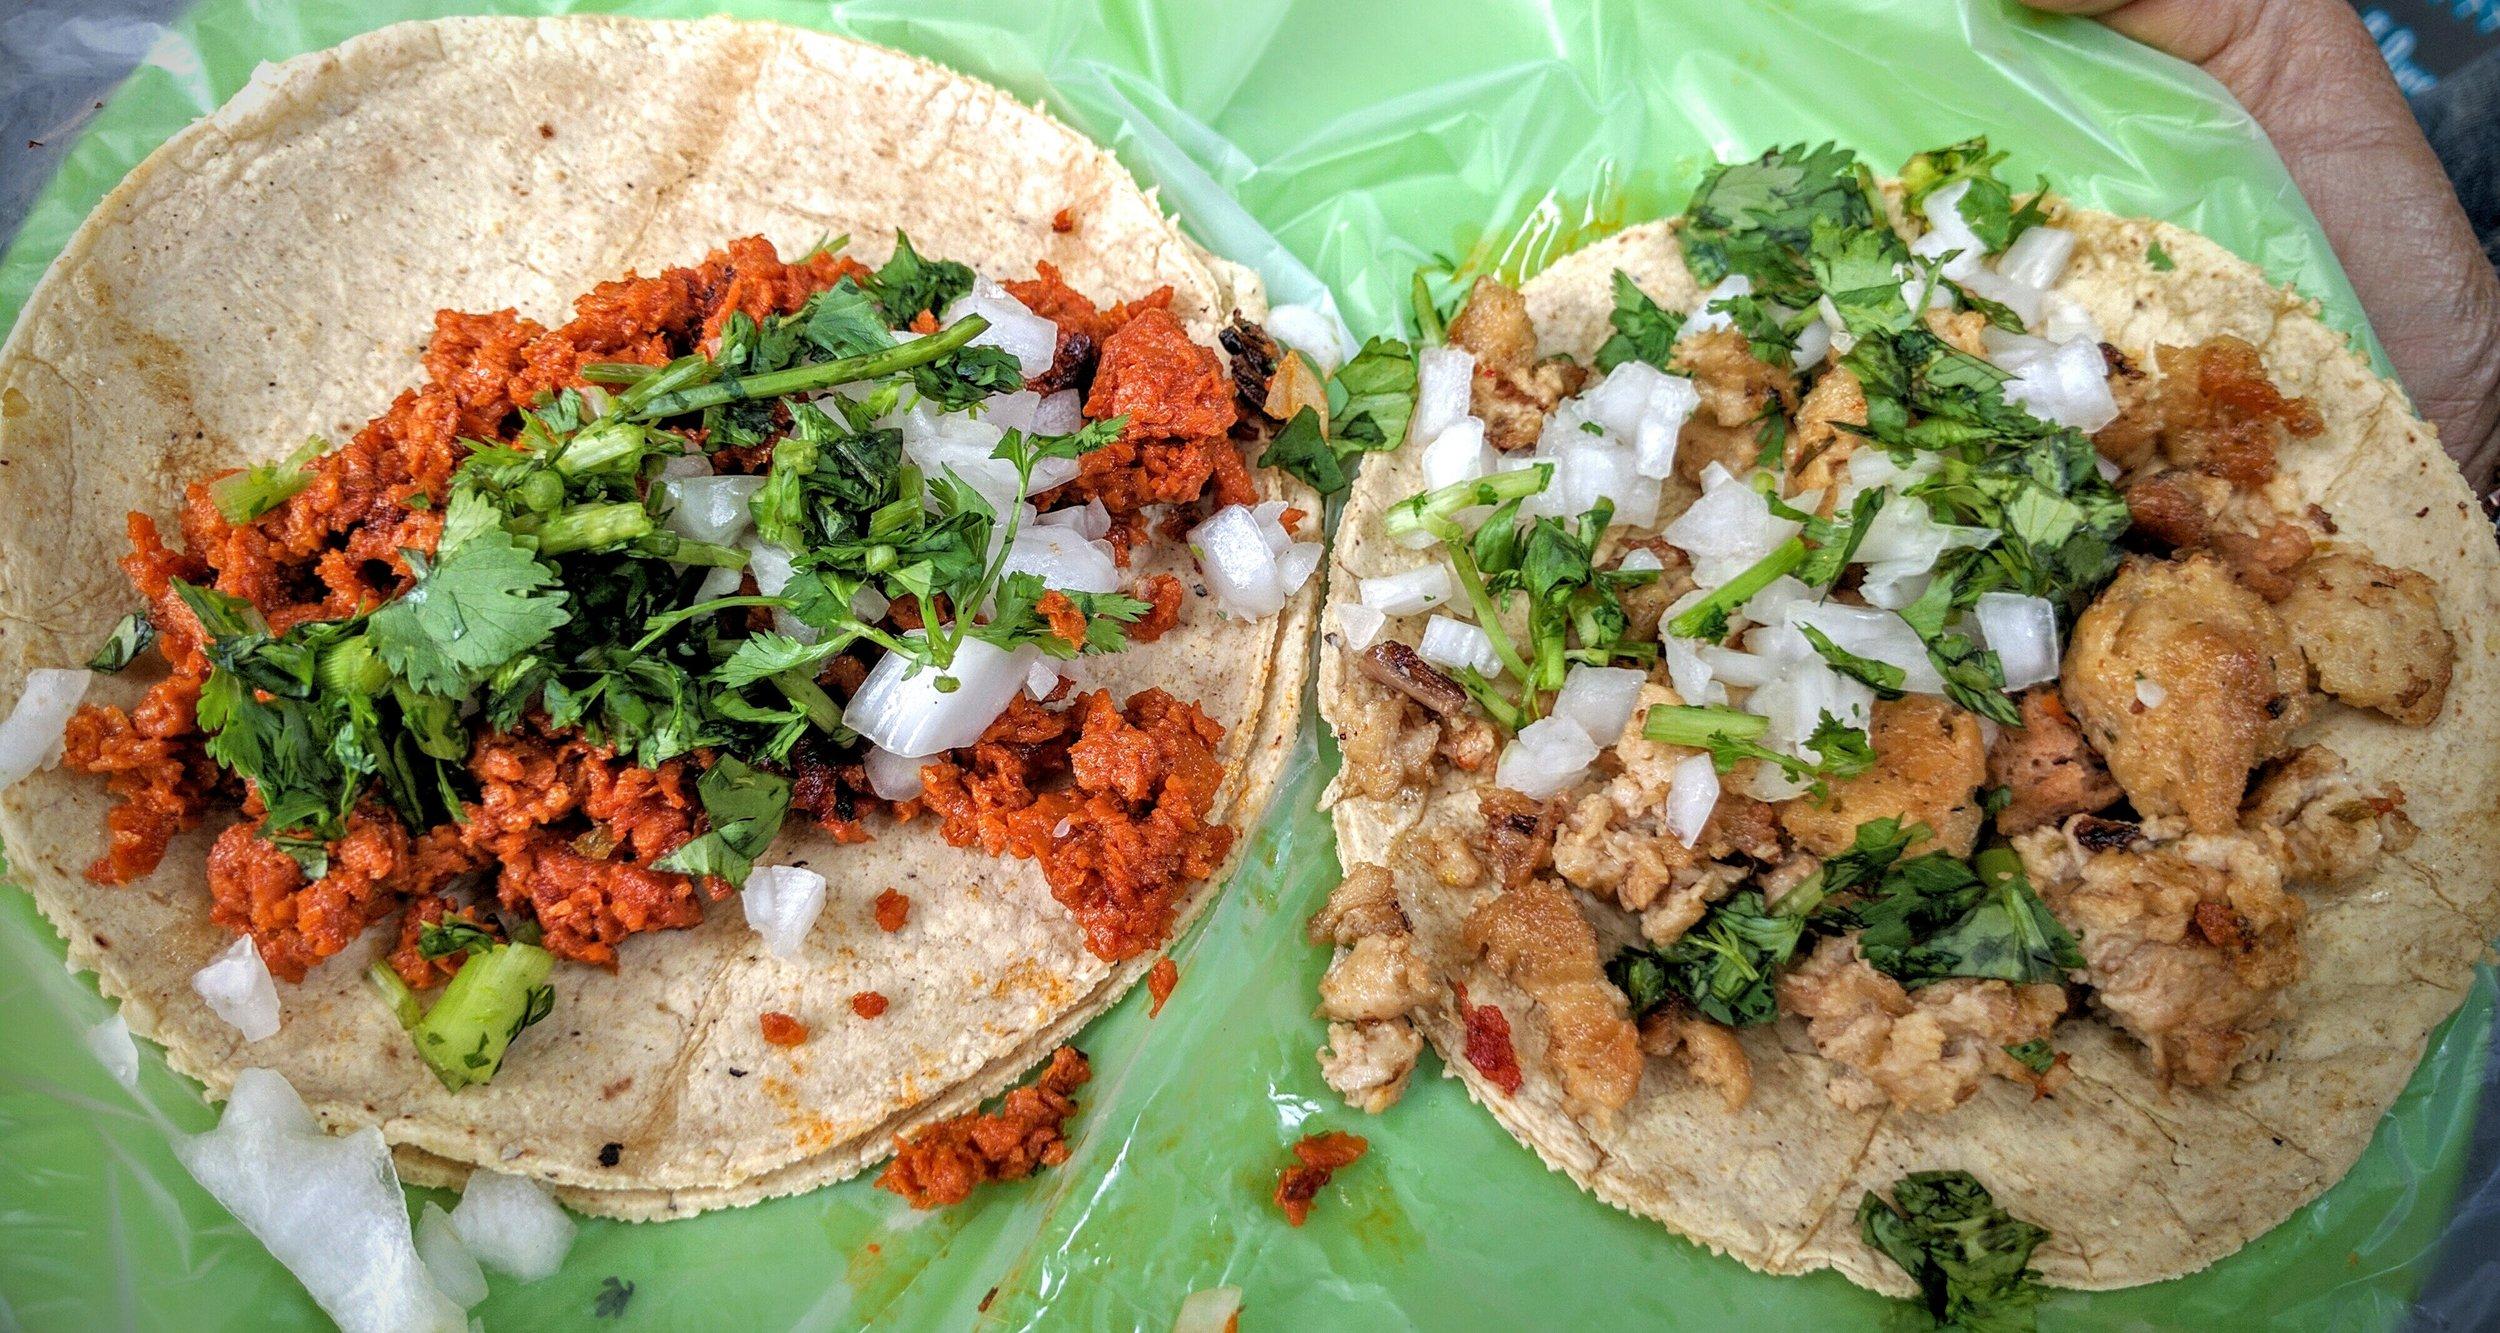 Vegan Street Tacos -Mexico City, Mexico